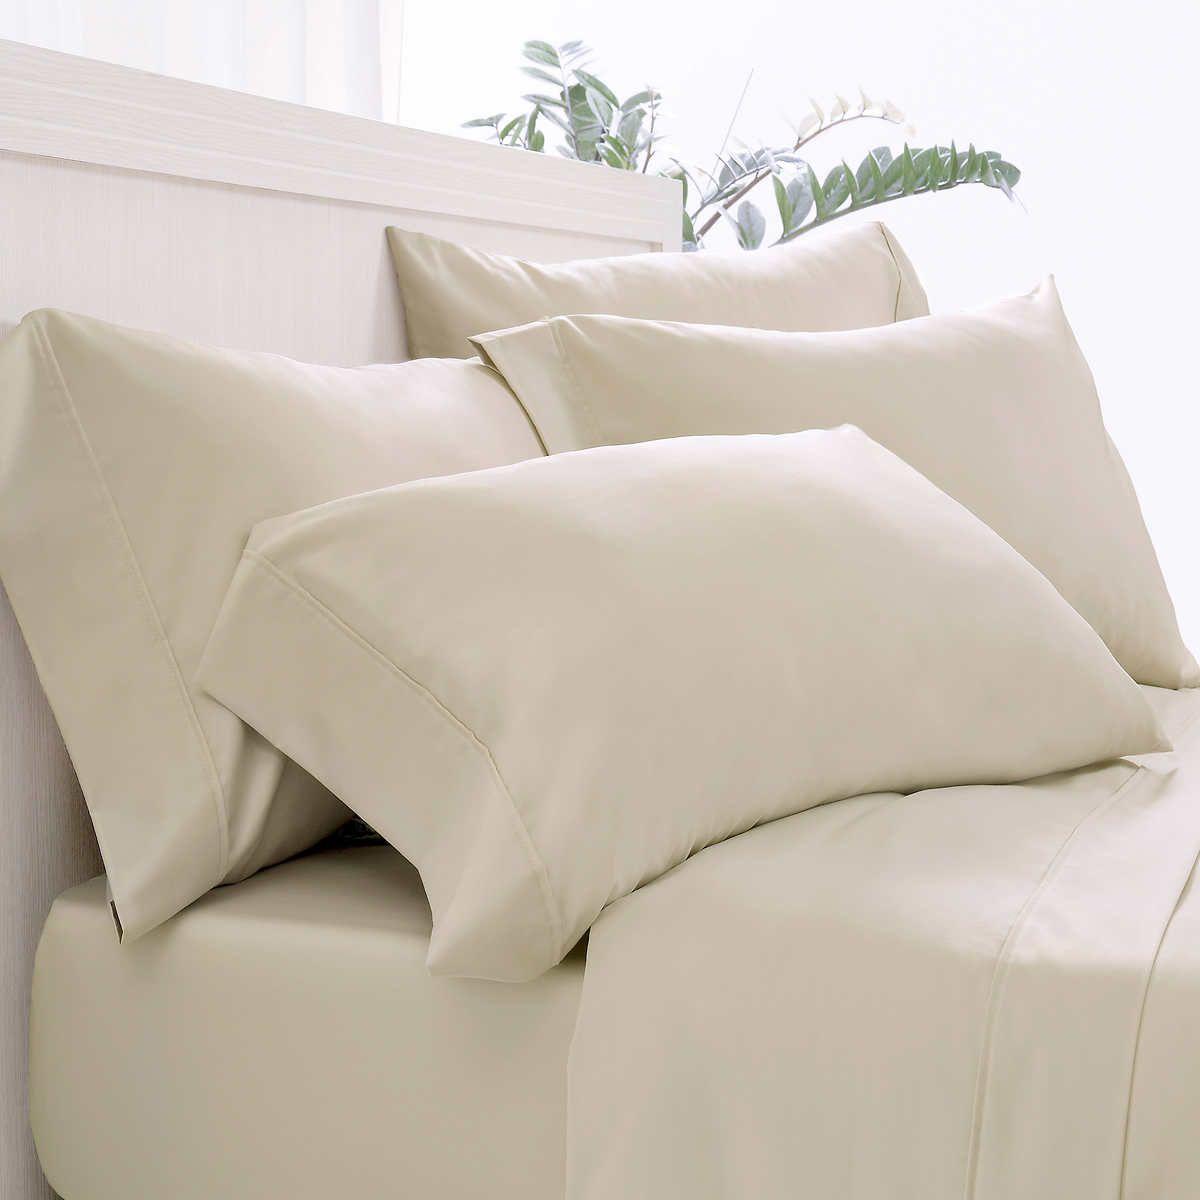 Charisma 400 Thread Count 6 Piece Sheet Set Sheet Sets Bed Sizes Sheet